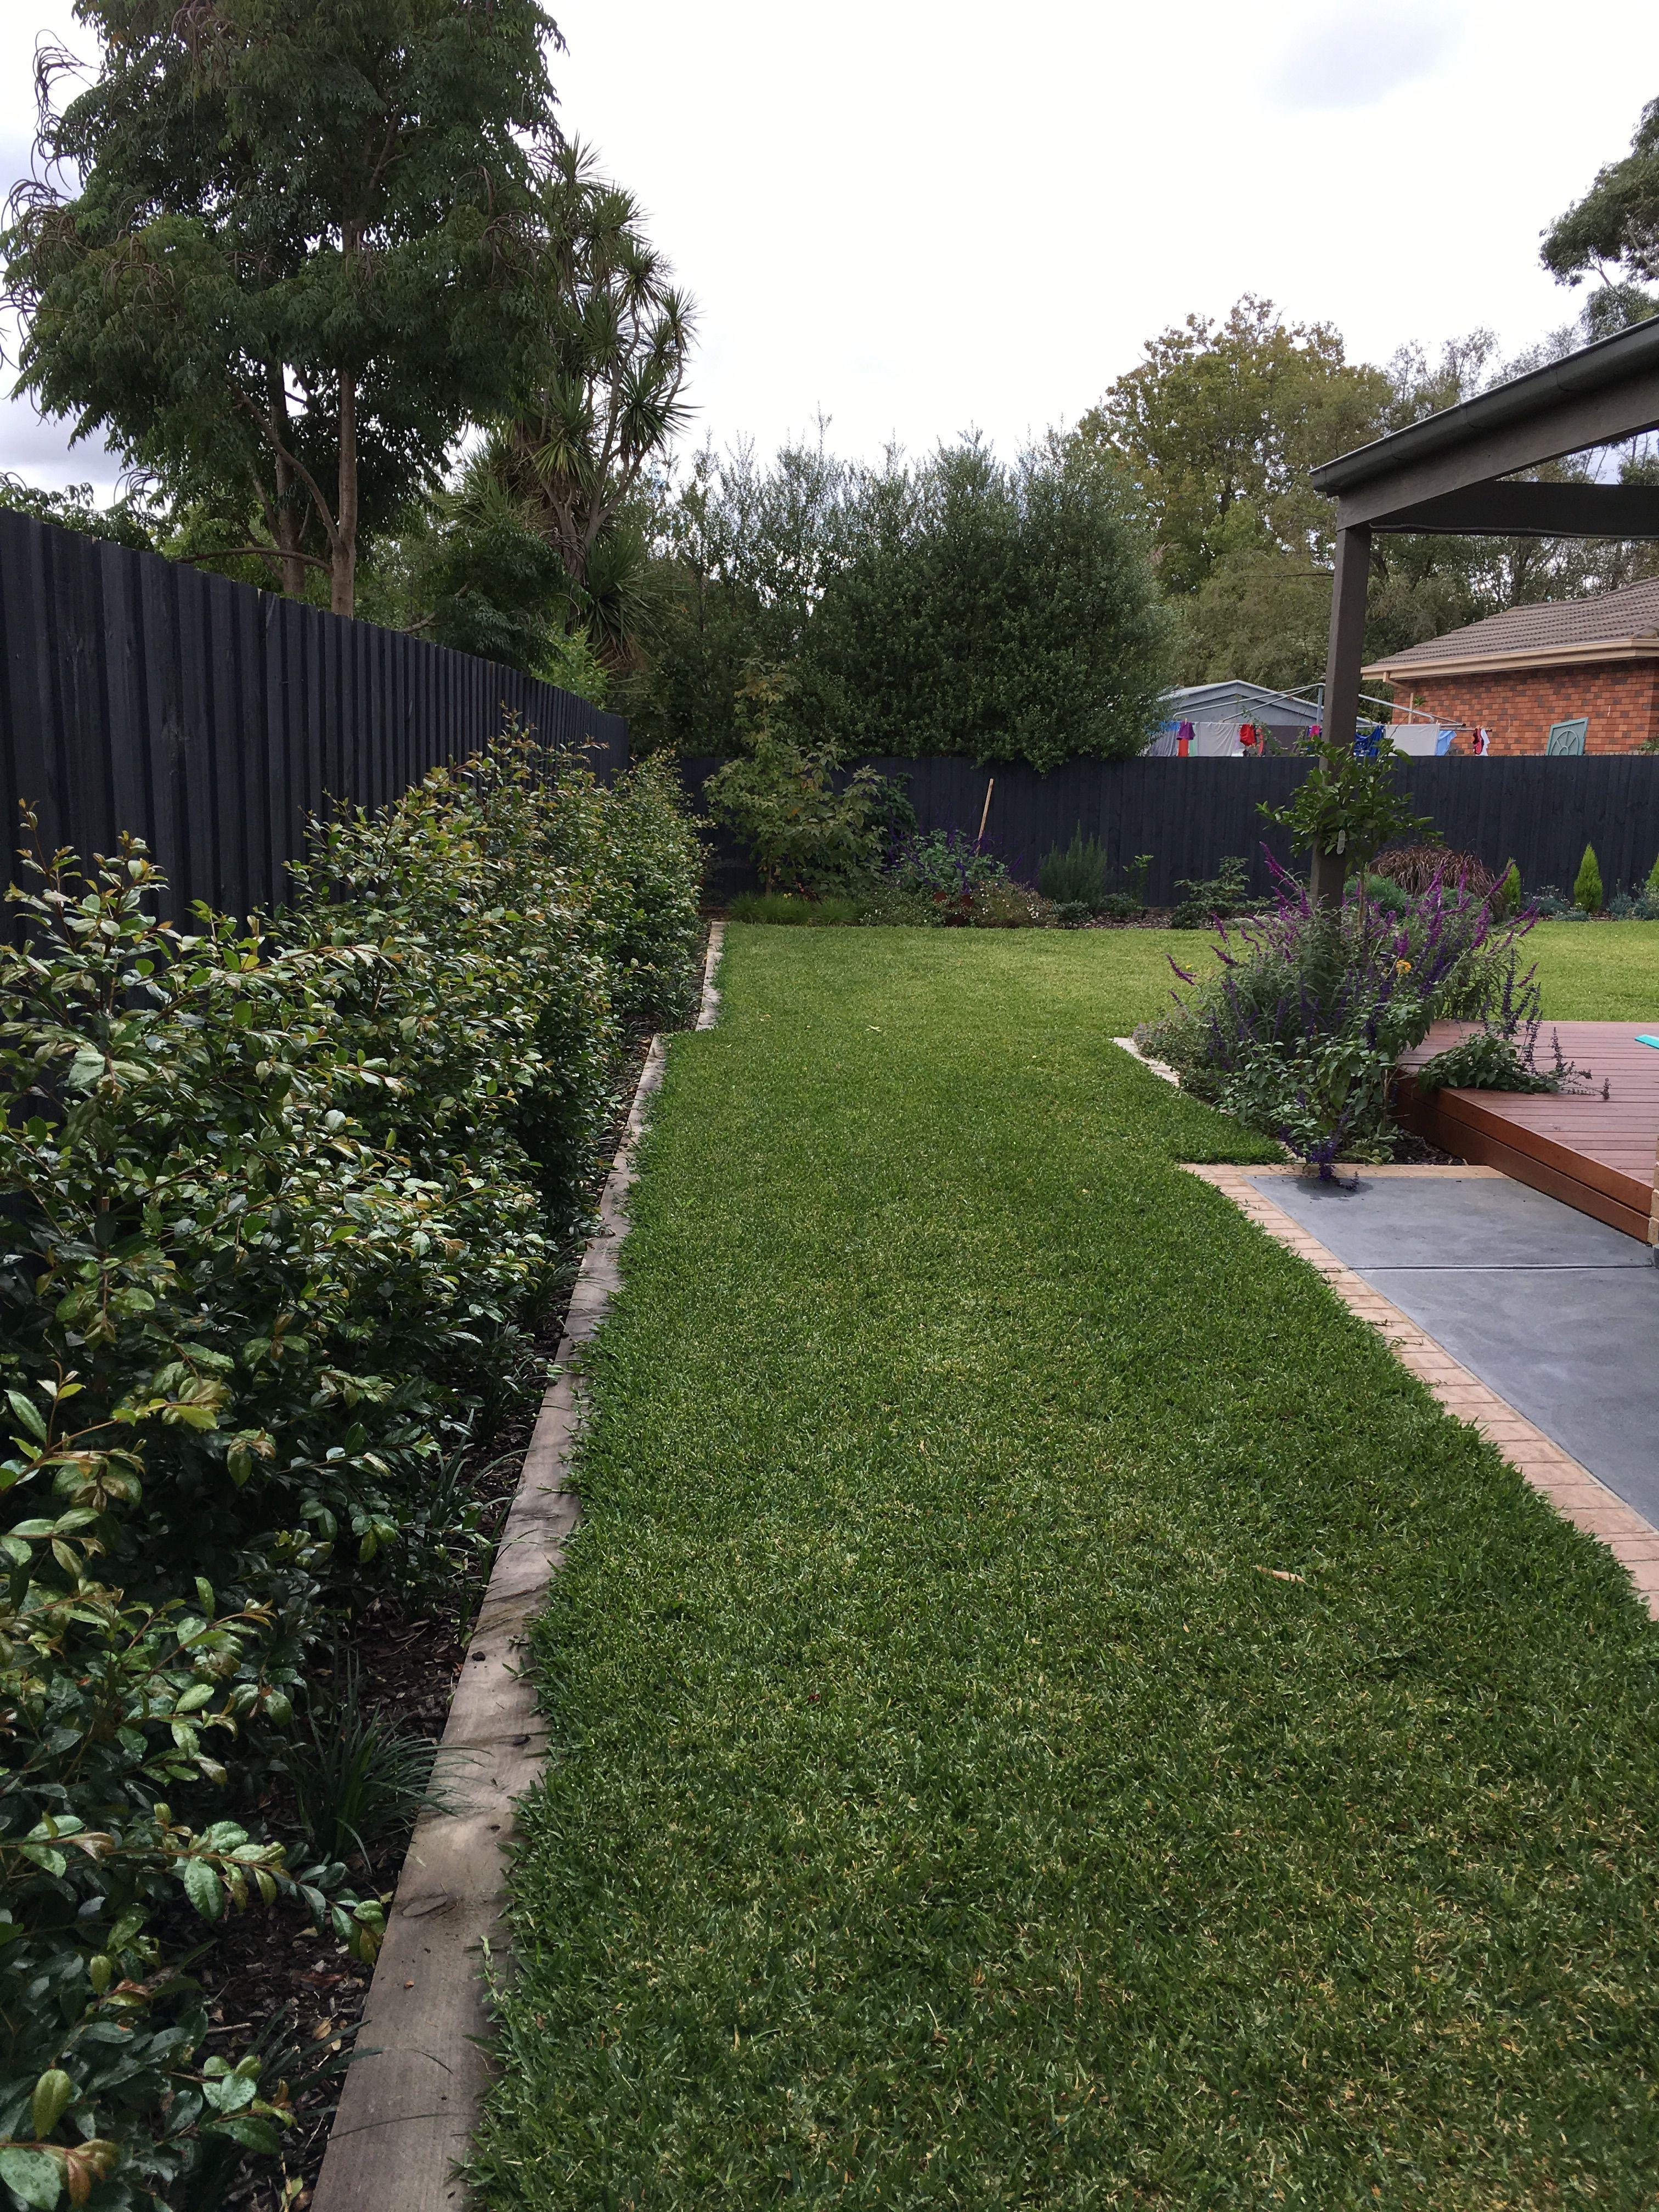 Syzygium Paniculata Backyard Bliss Florida Landscaping Backyard Landscaping Designs Outdoor Gardens